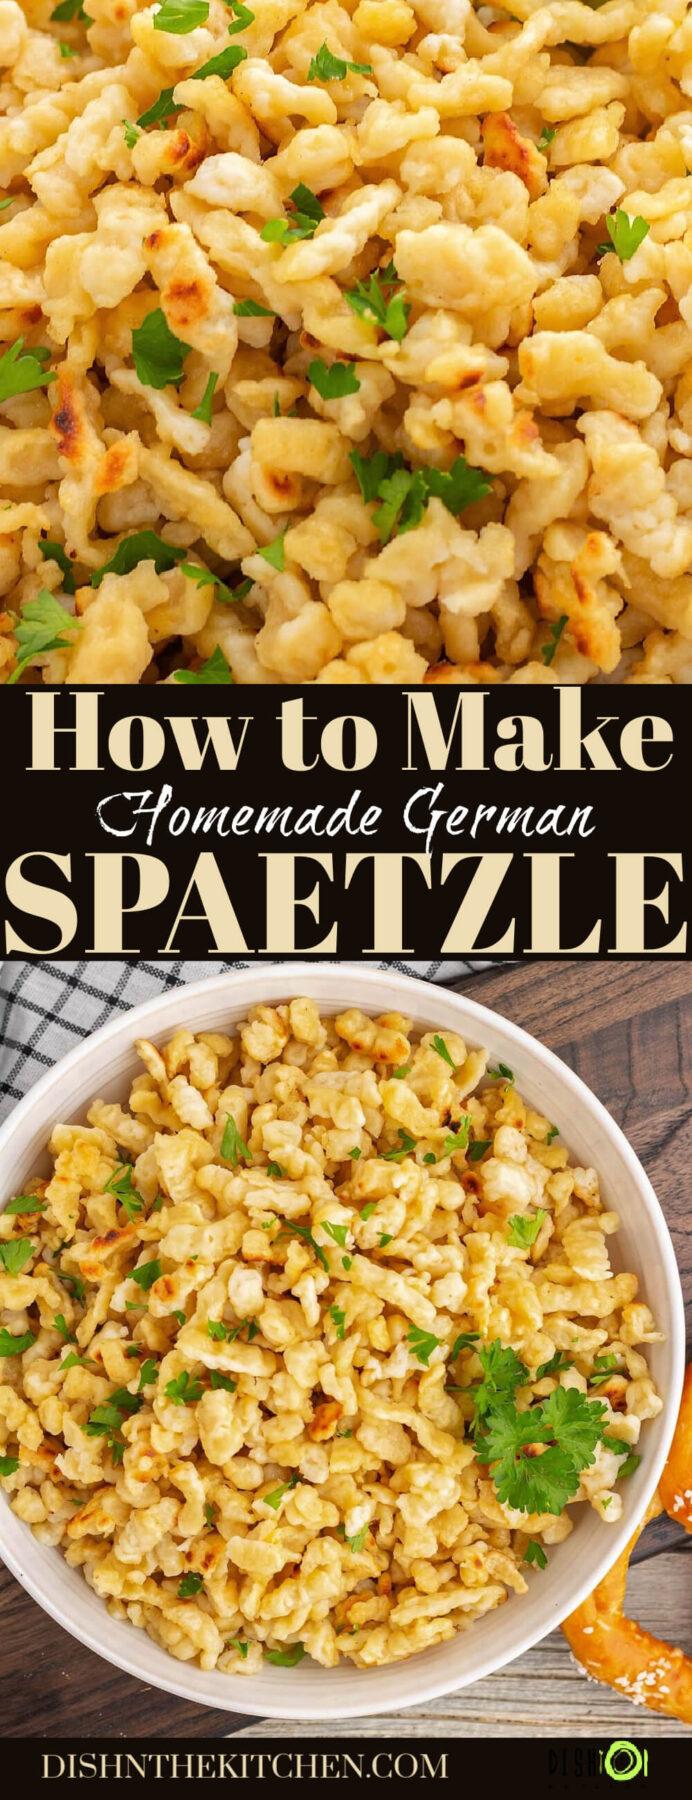 Pinterest image feature homemade spaetzle noodles.